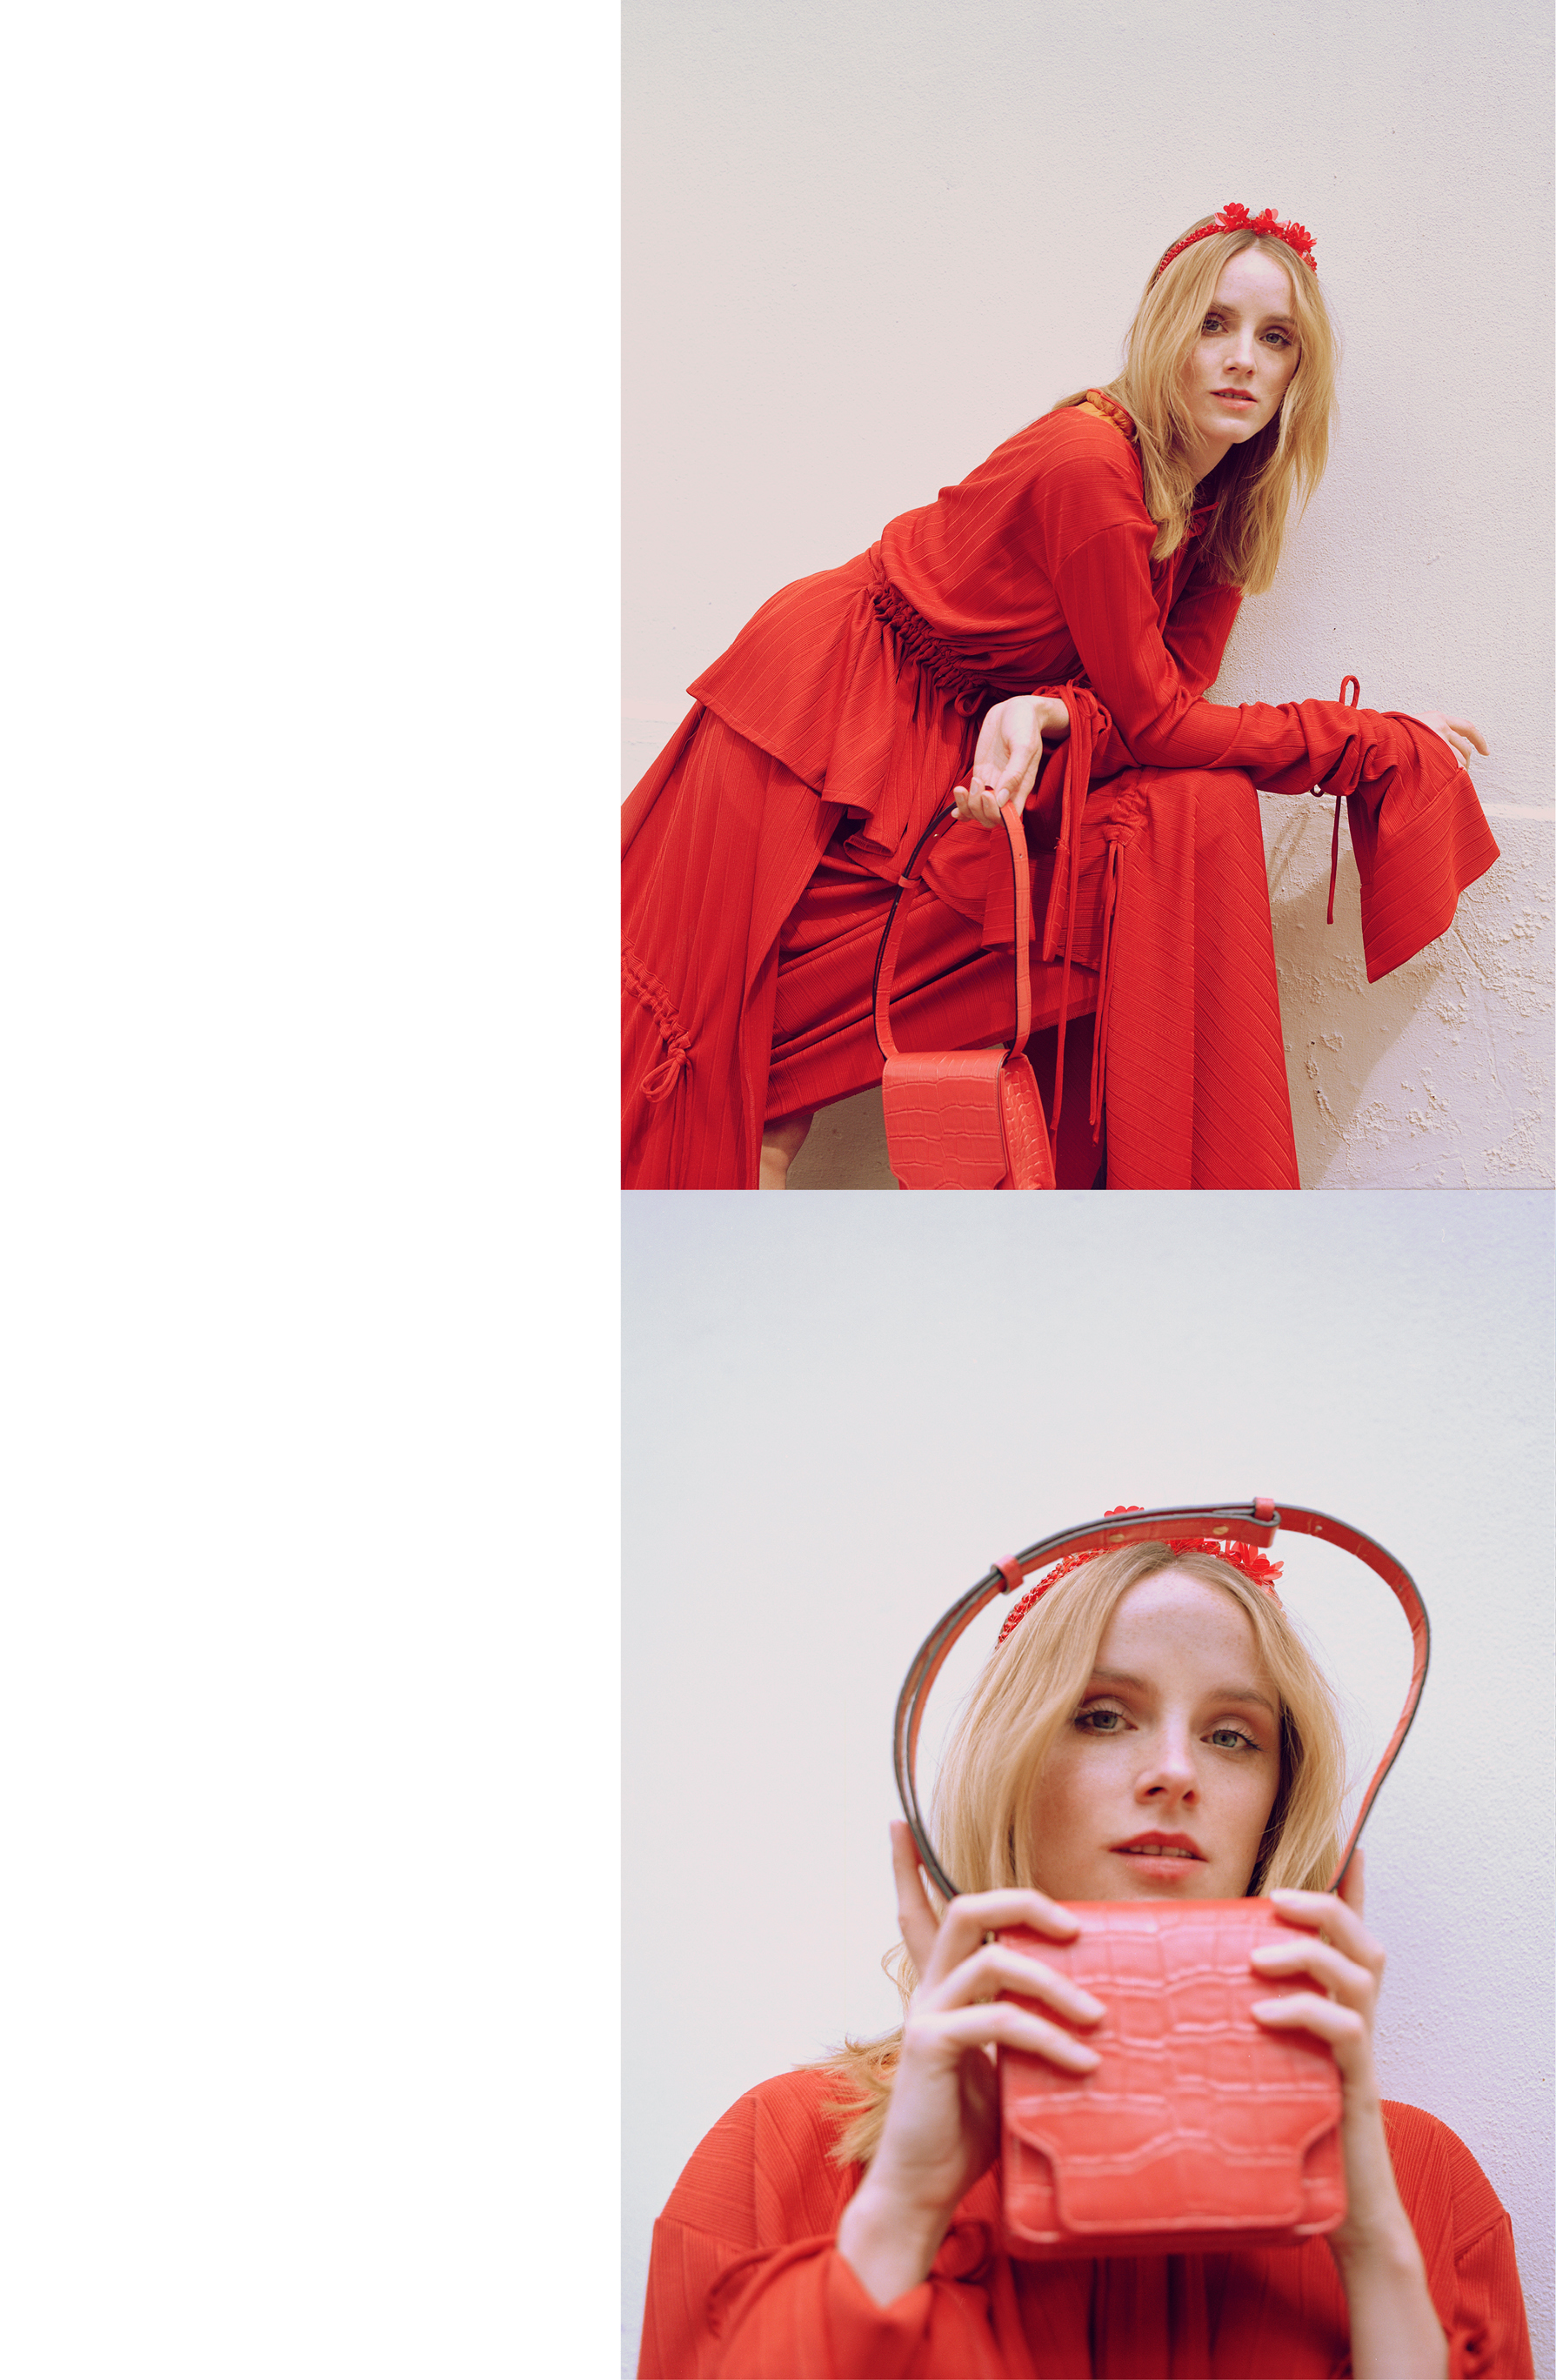 All clothing by Richard Malone. Bag by Marge Sherwood. Headband by Simone Rocha.